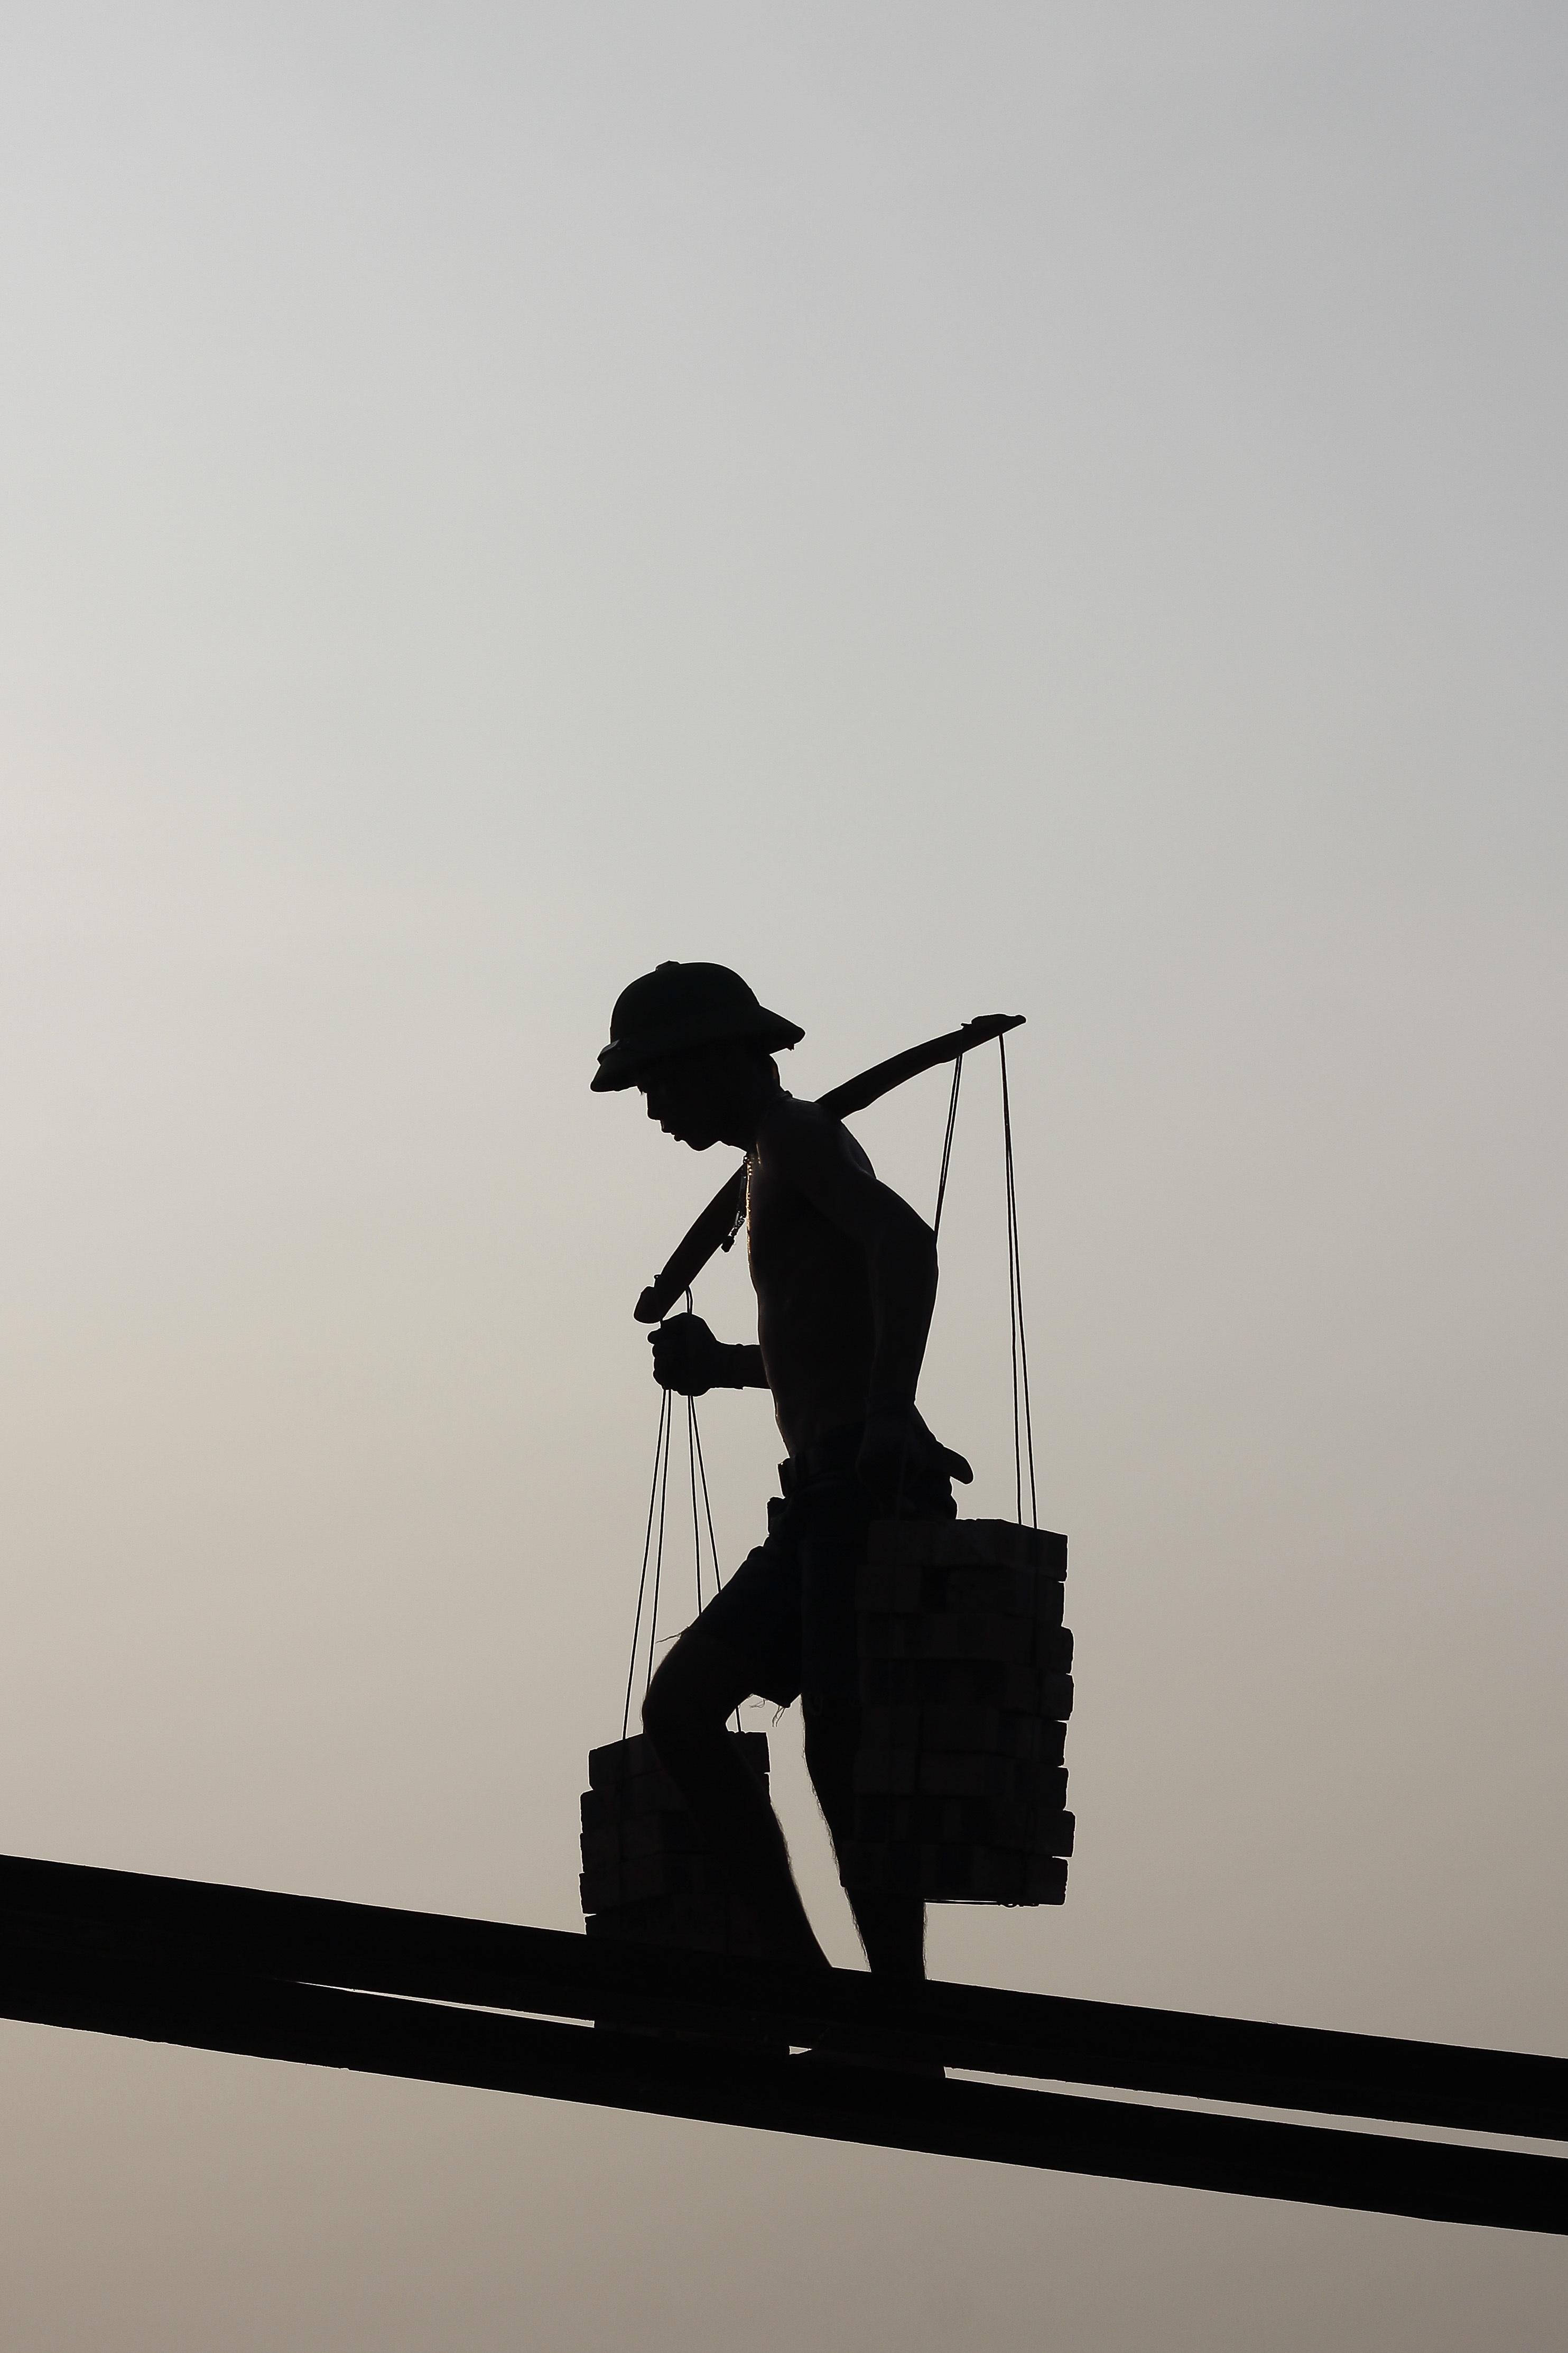 Unduh 103 Background Foto Untuk Kerja Paling Keren